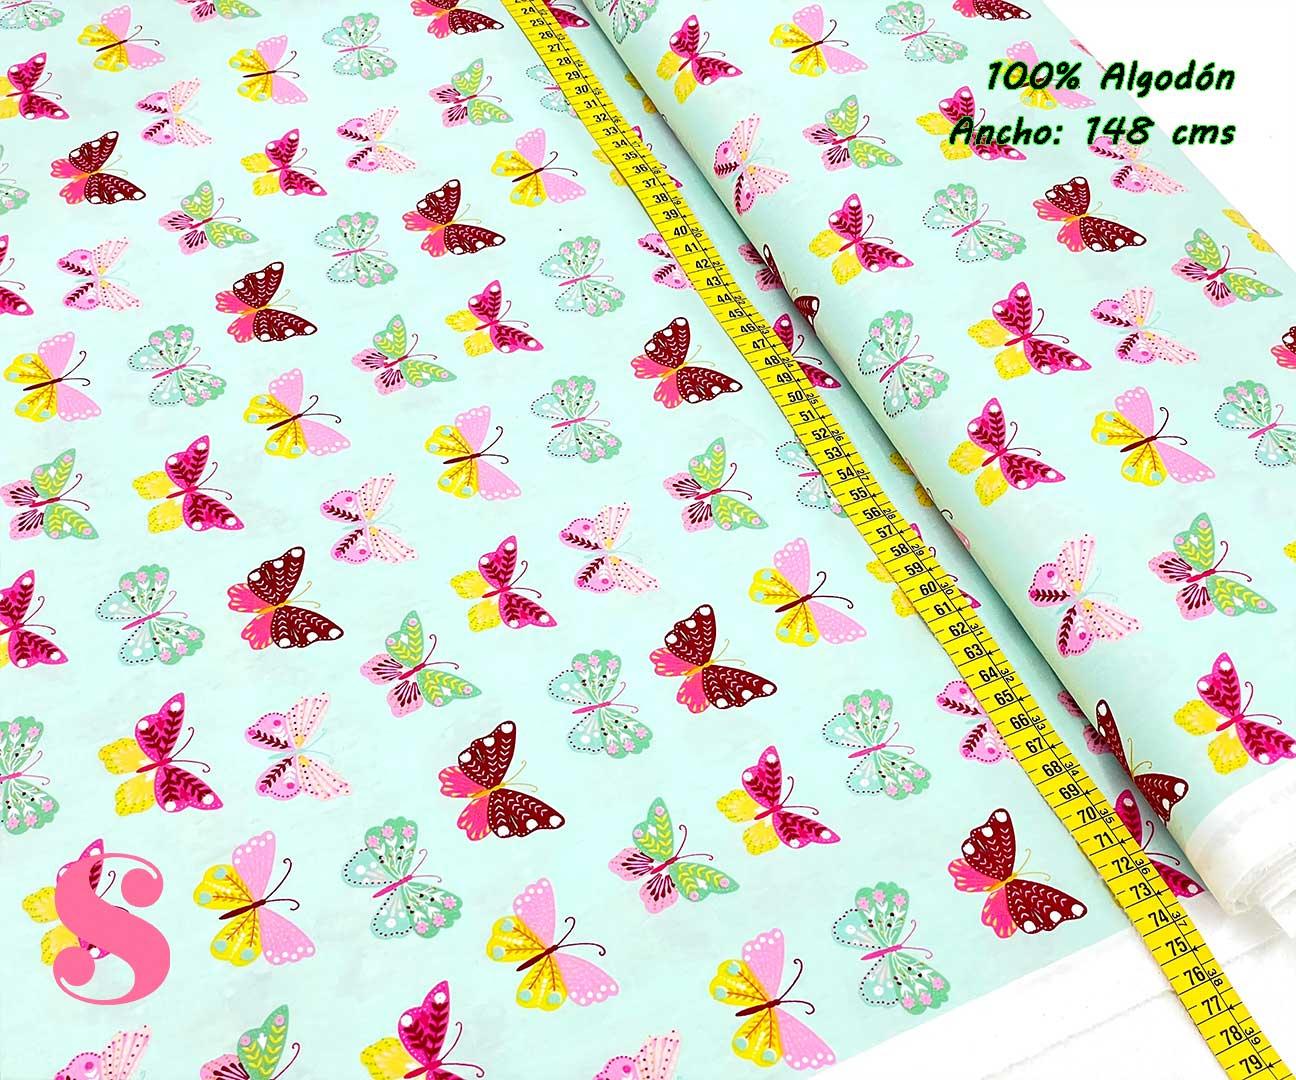 82-tela-estampada-flores,telas-dibujos-primaverales,telas-infantiles,tejidos-infantiles,Tejido Estampado Butterflys fondo Menta